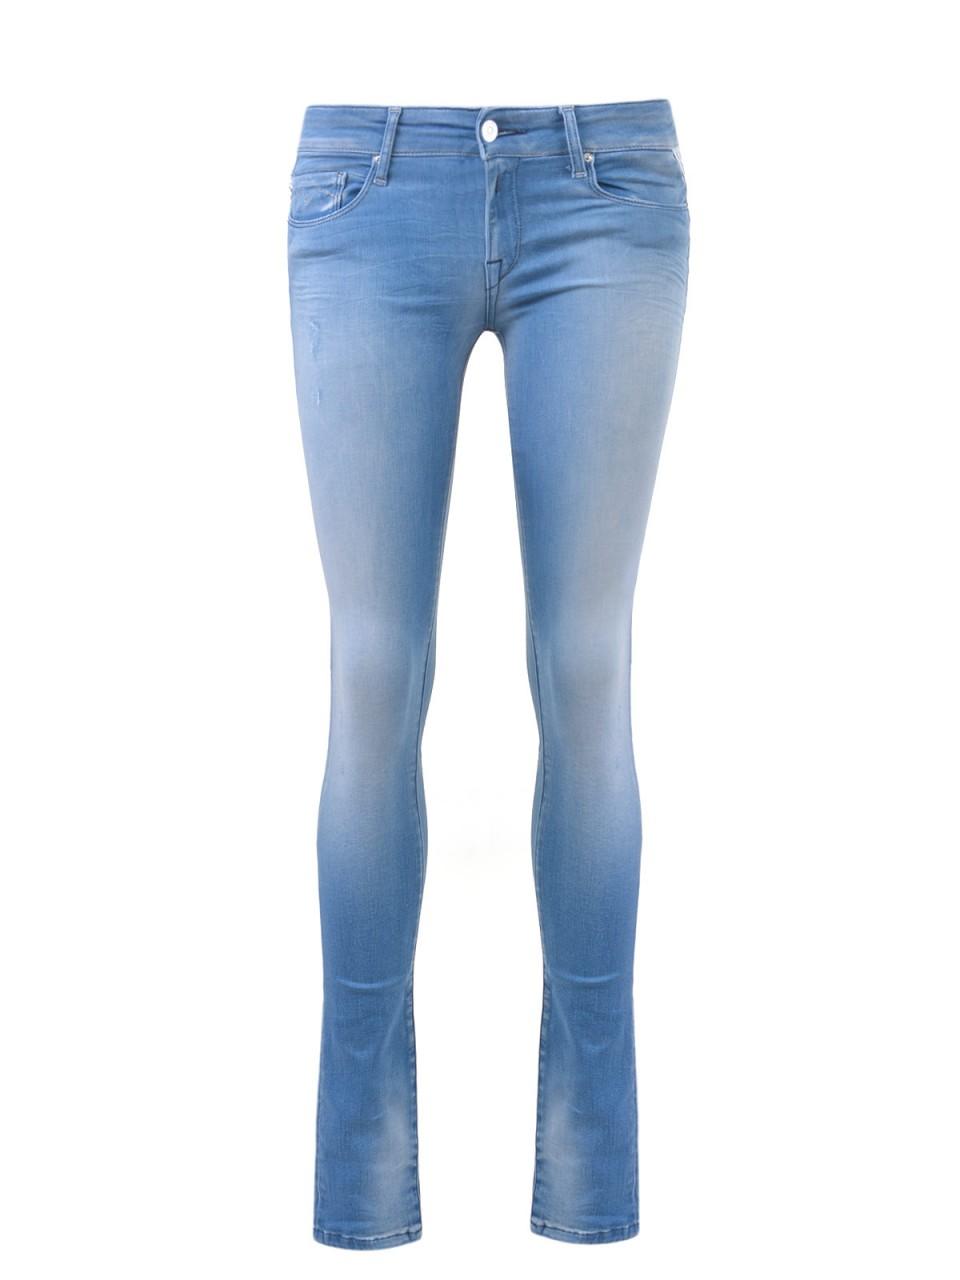 replay-damen-jeans-blau